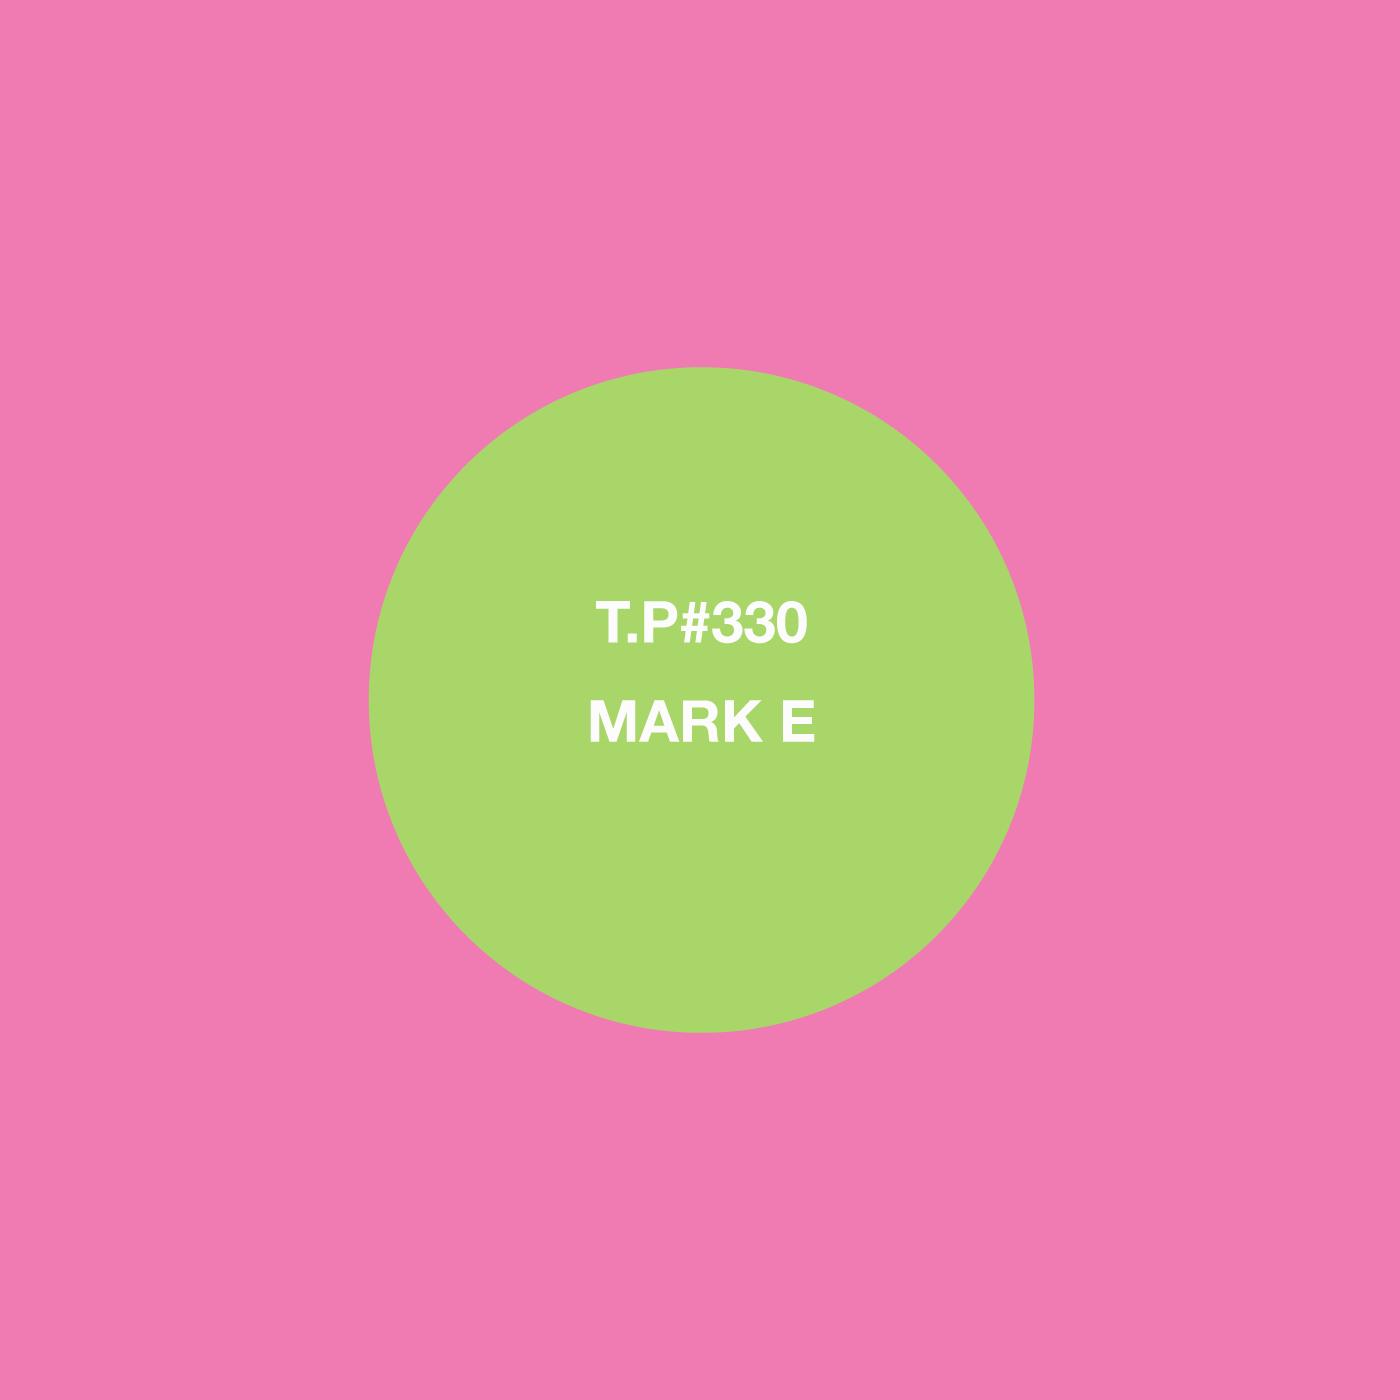 Mark E, Mix, Test Pressing, Merc, Golf Channel, Project E